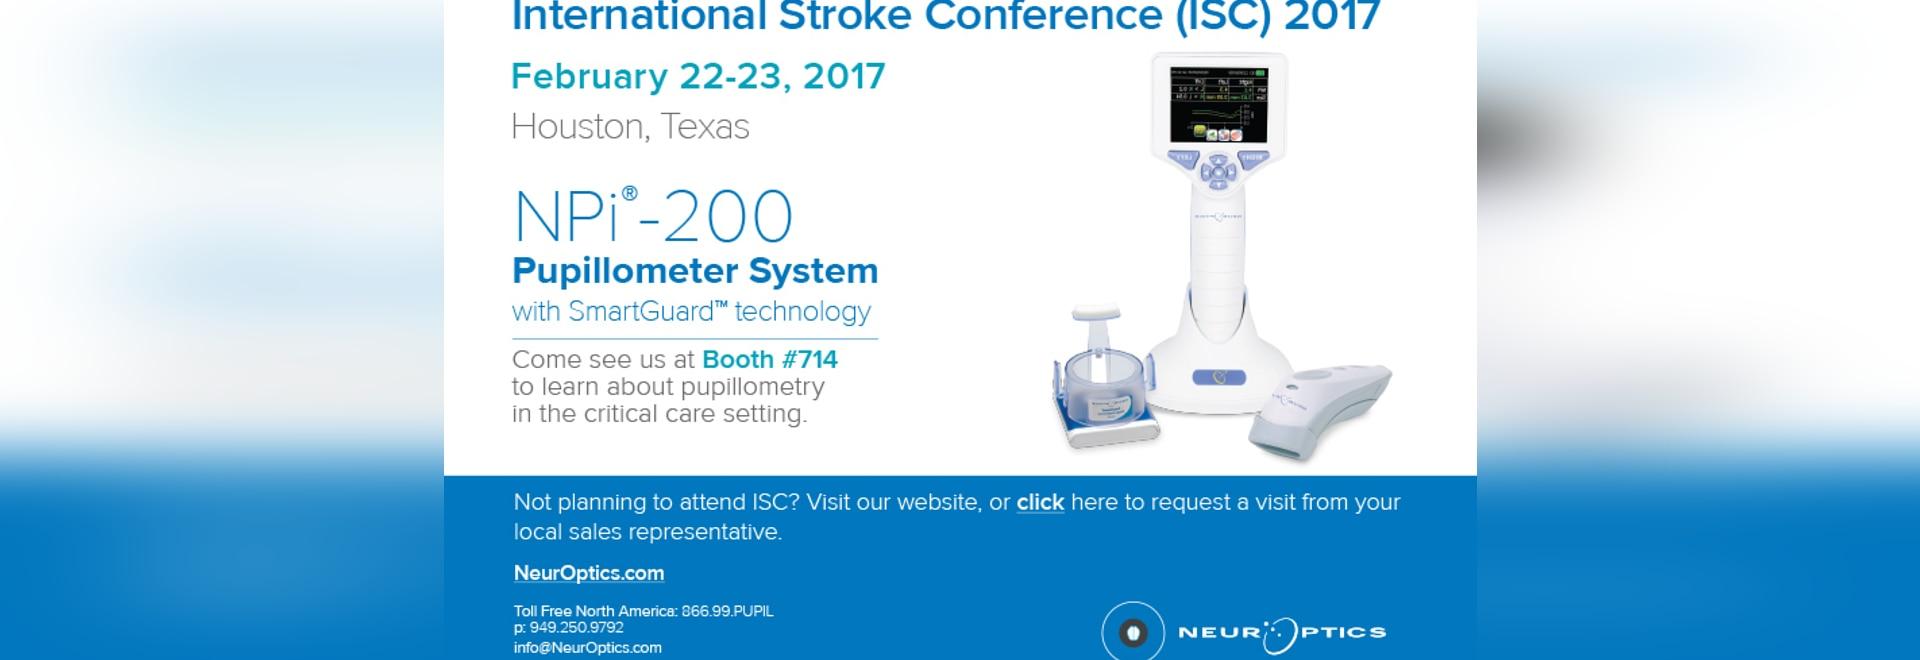 International Stroke Conference 2017